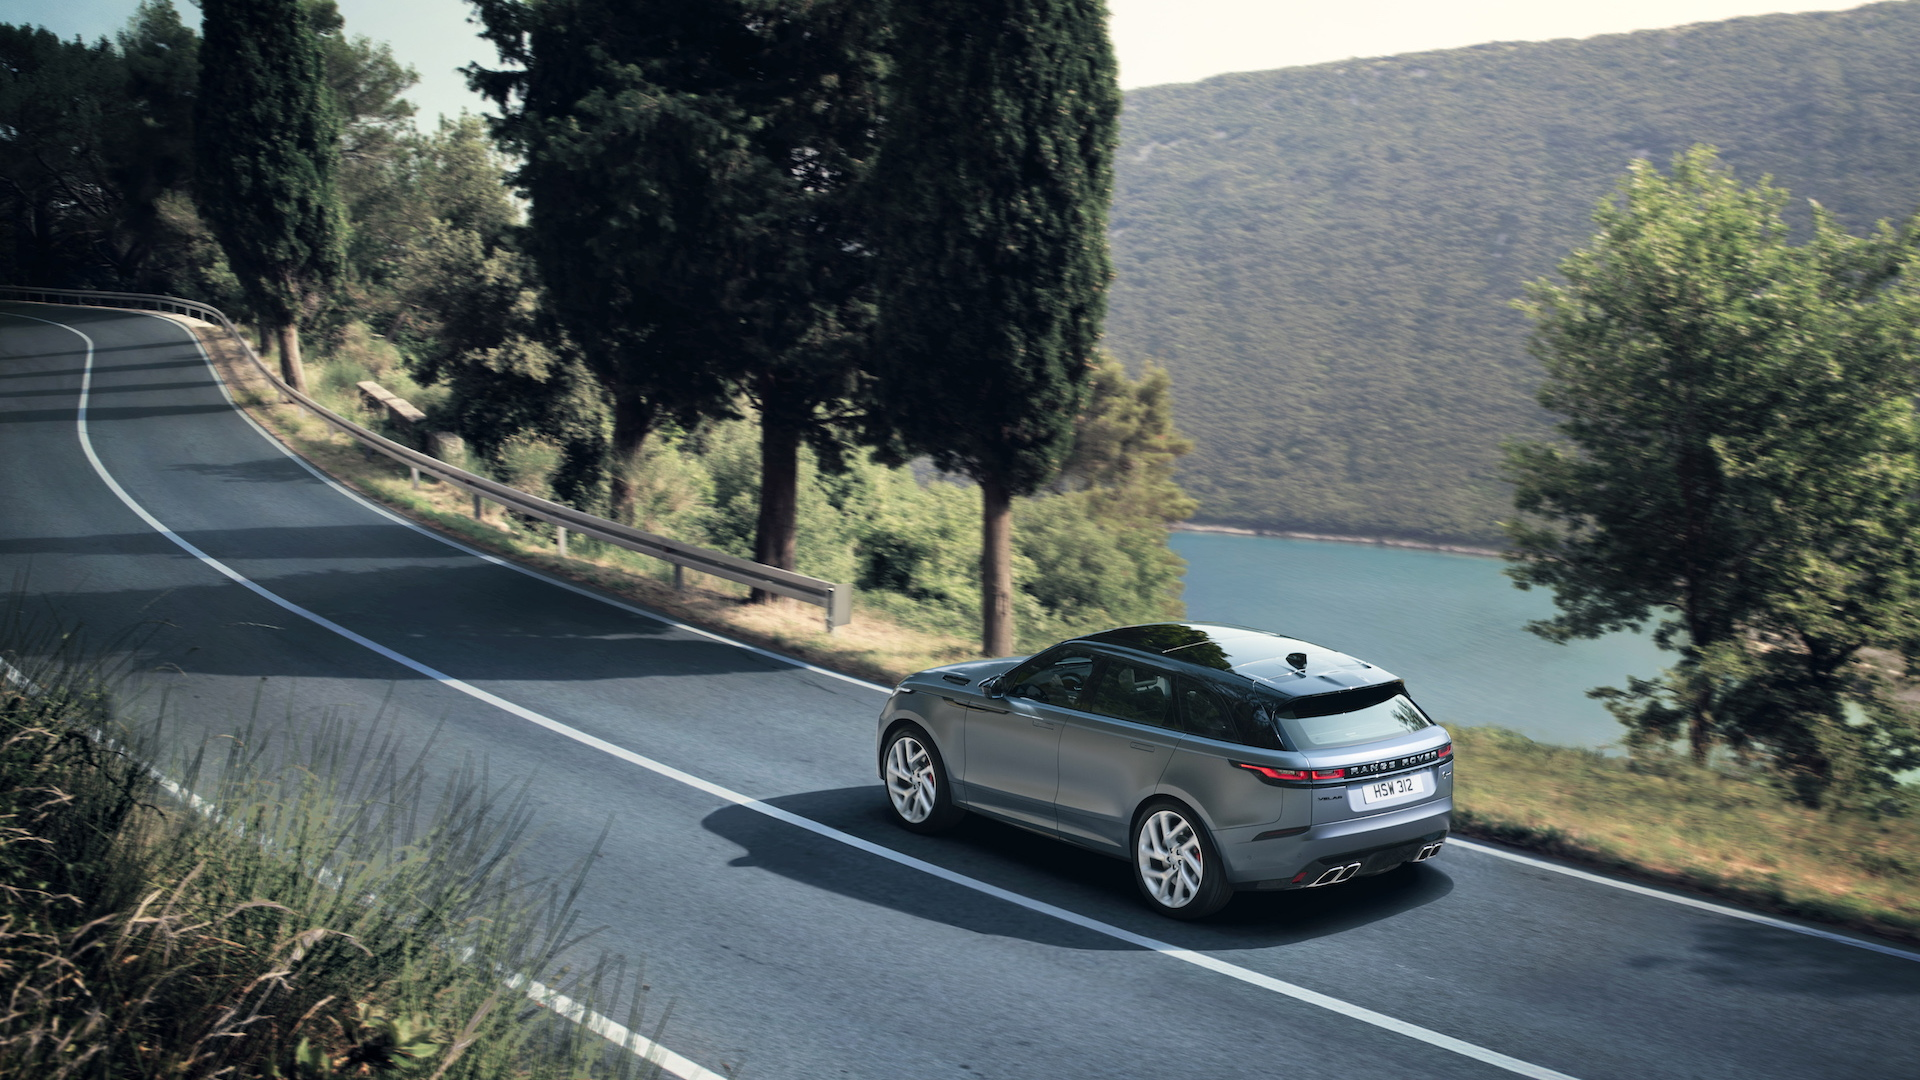 Land Rover Range Rover SVA Dynamic Edition